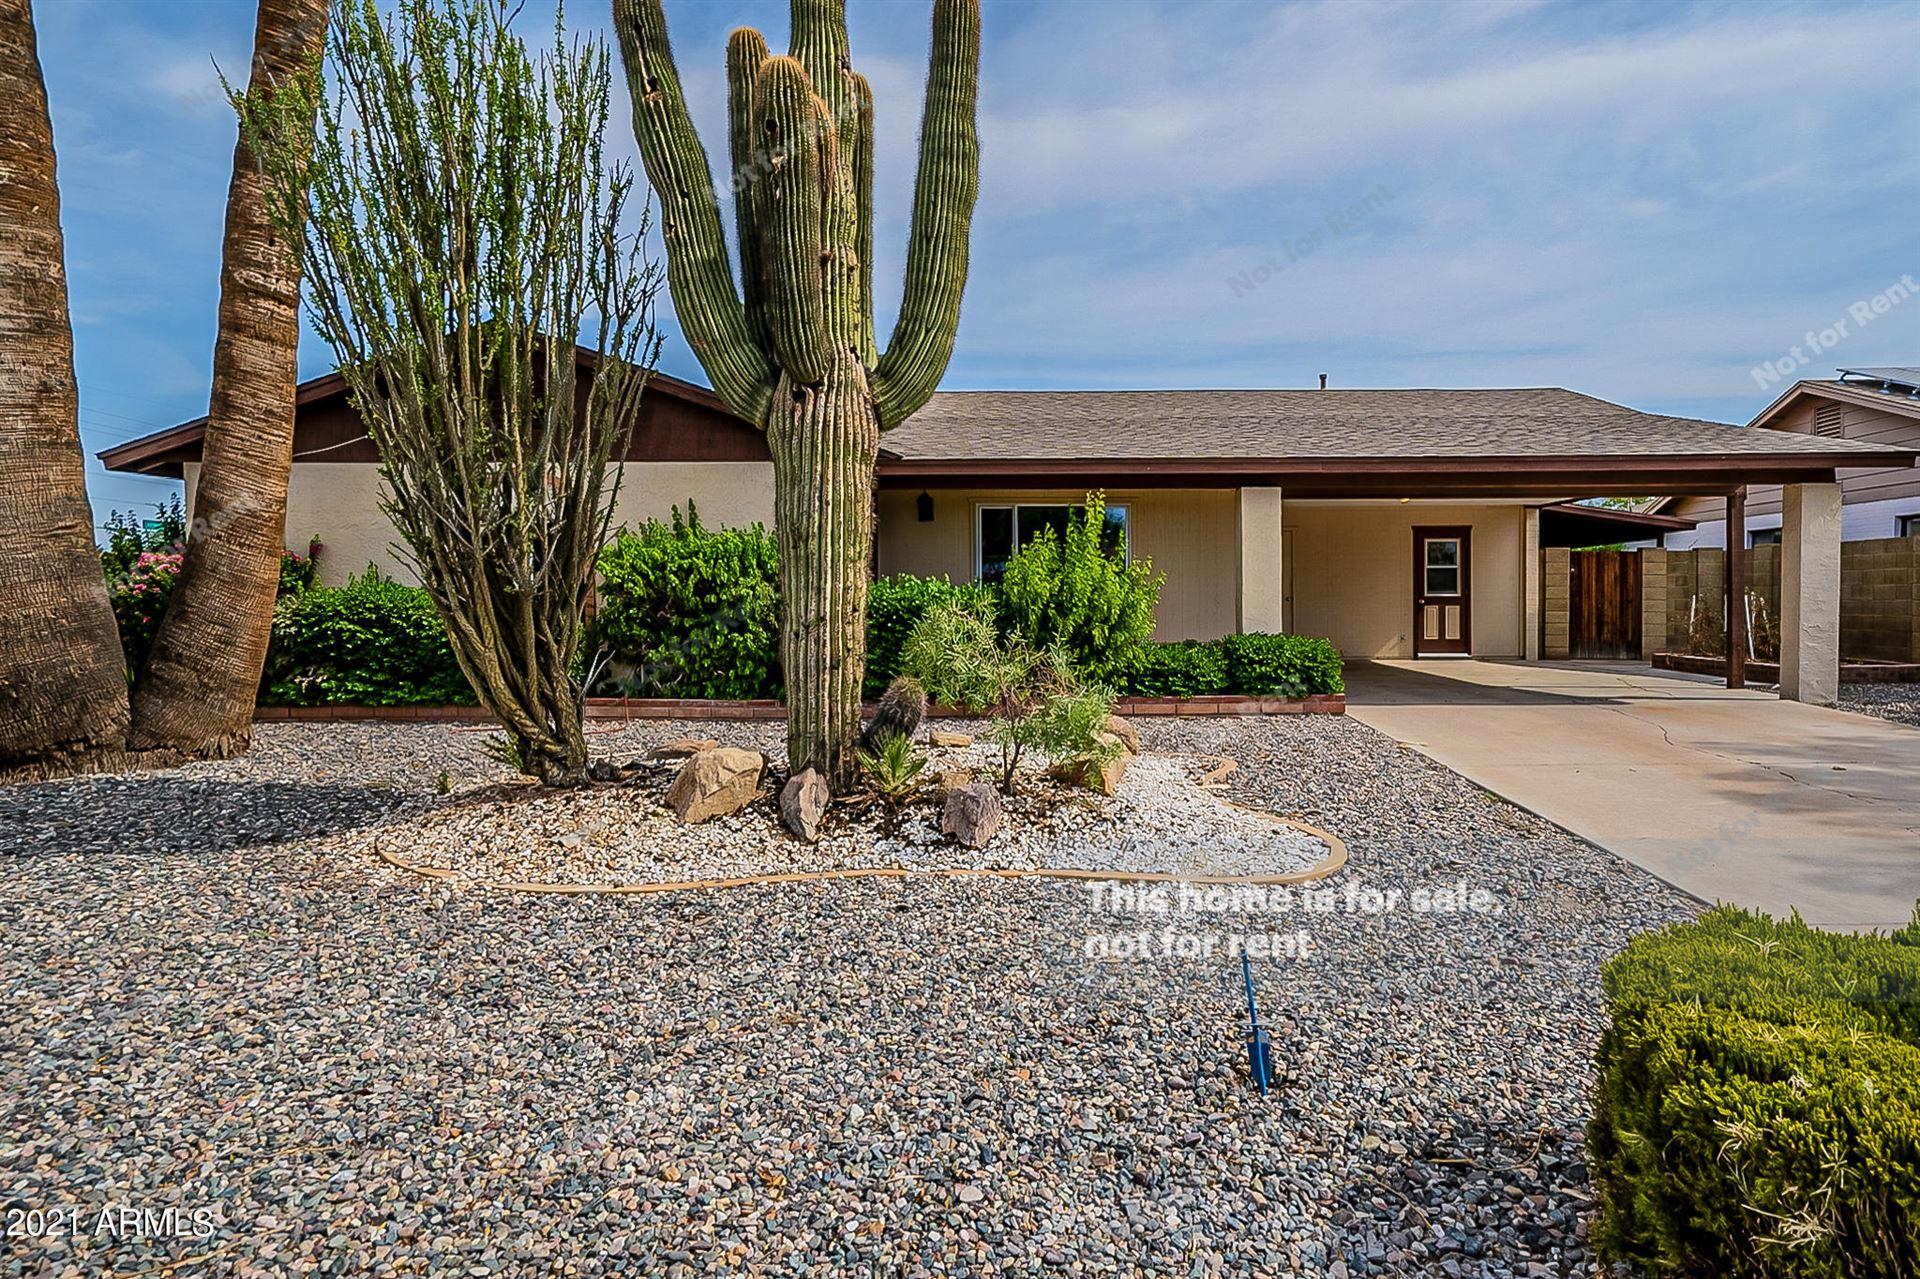 4236 W GARDEN Drive, Phoenix, AZ 85029 - MLS#: 6263151